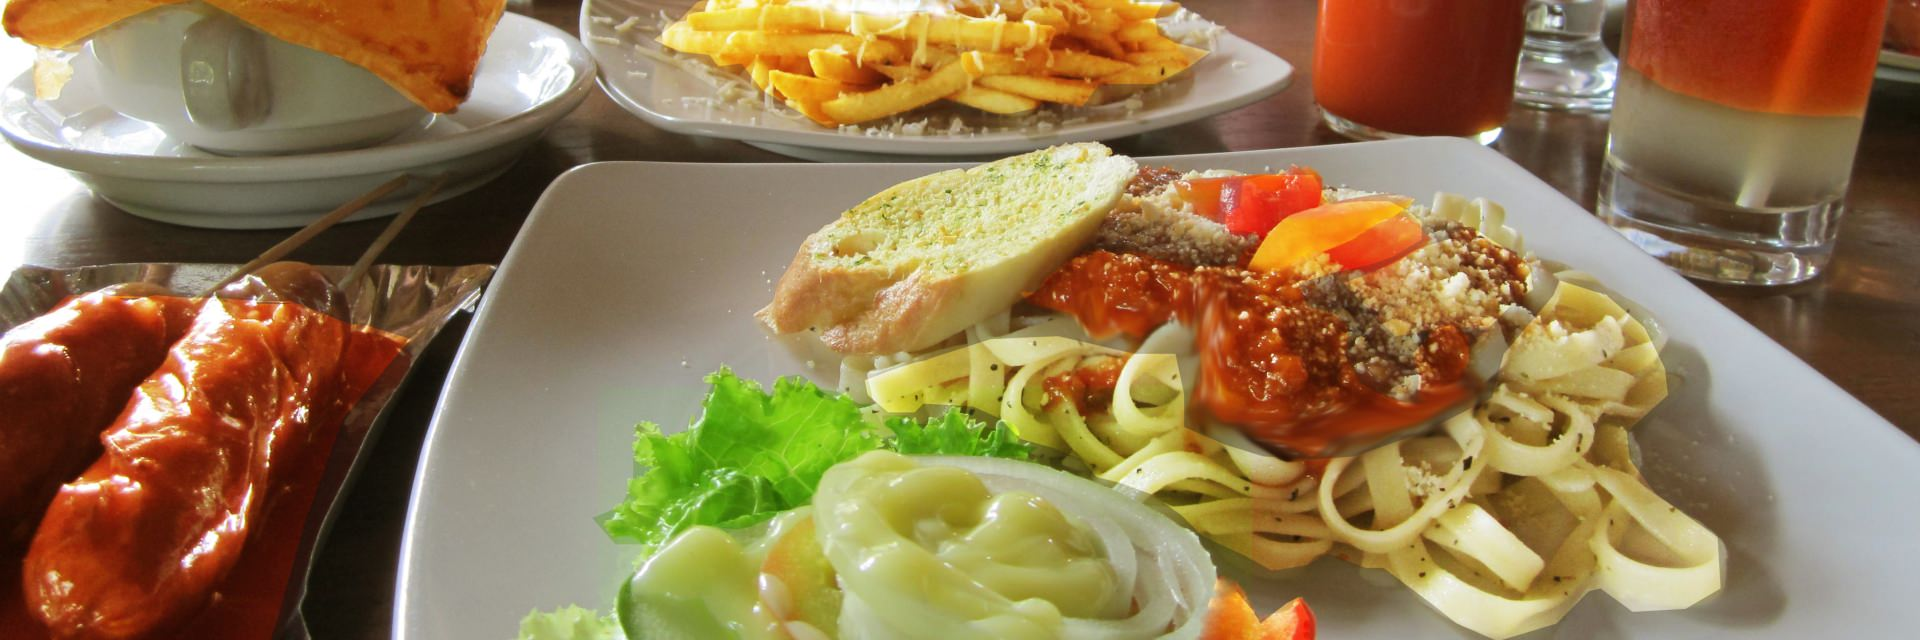 Kuliner Paling Kekinian Bandung Kuliner Paling Kekinian Bandung - Dolan Dolen